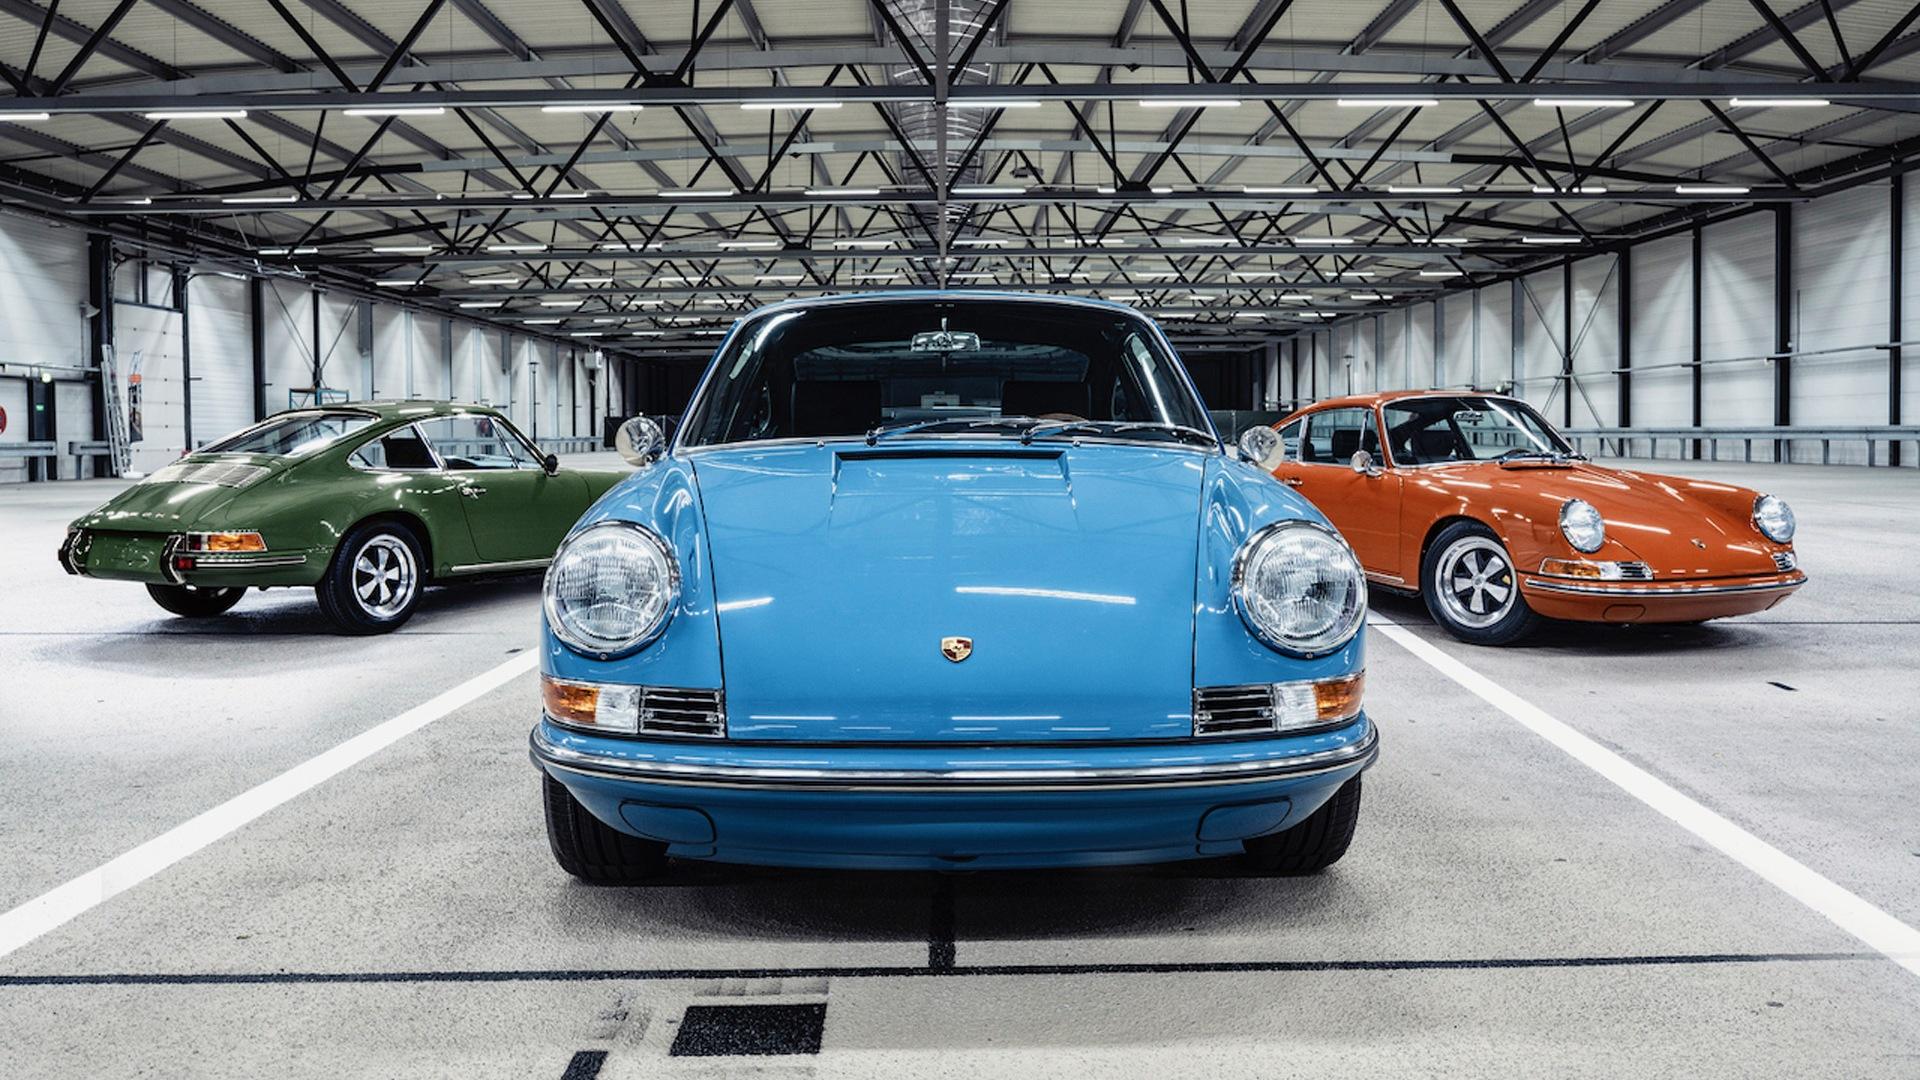 2019-voituresextravert-quintessenza-se_100707403.jpg